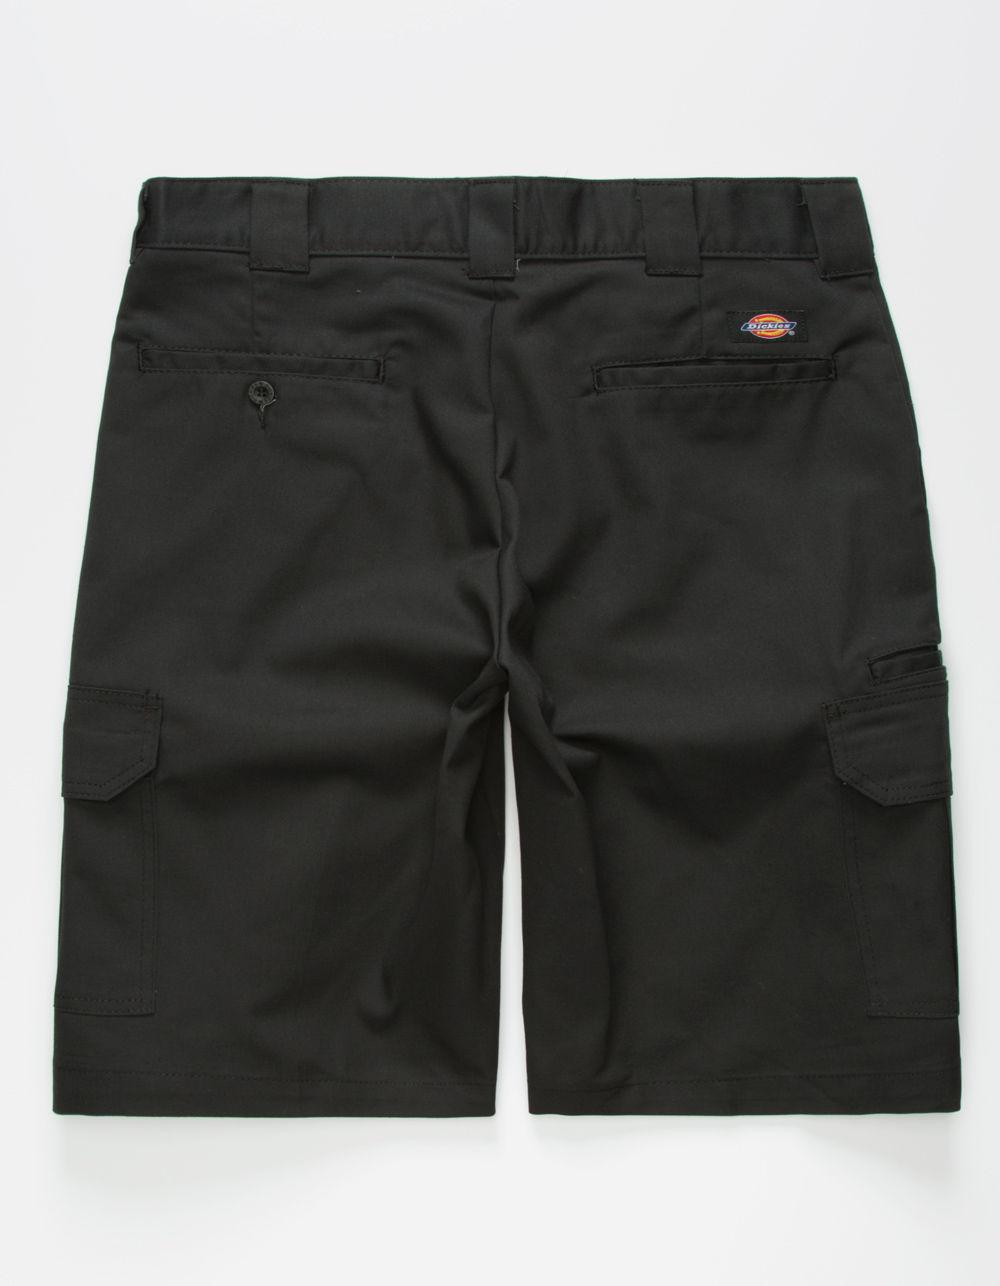 5e894059 Dickies - Flex Relaxed Fit Black Mens Cargo Shorts for Men - Lyst. View  fullscreen